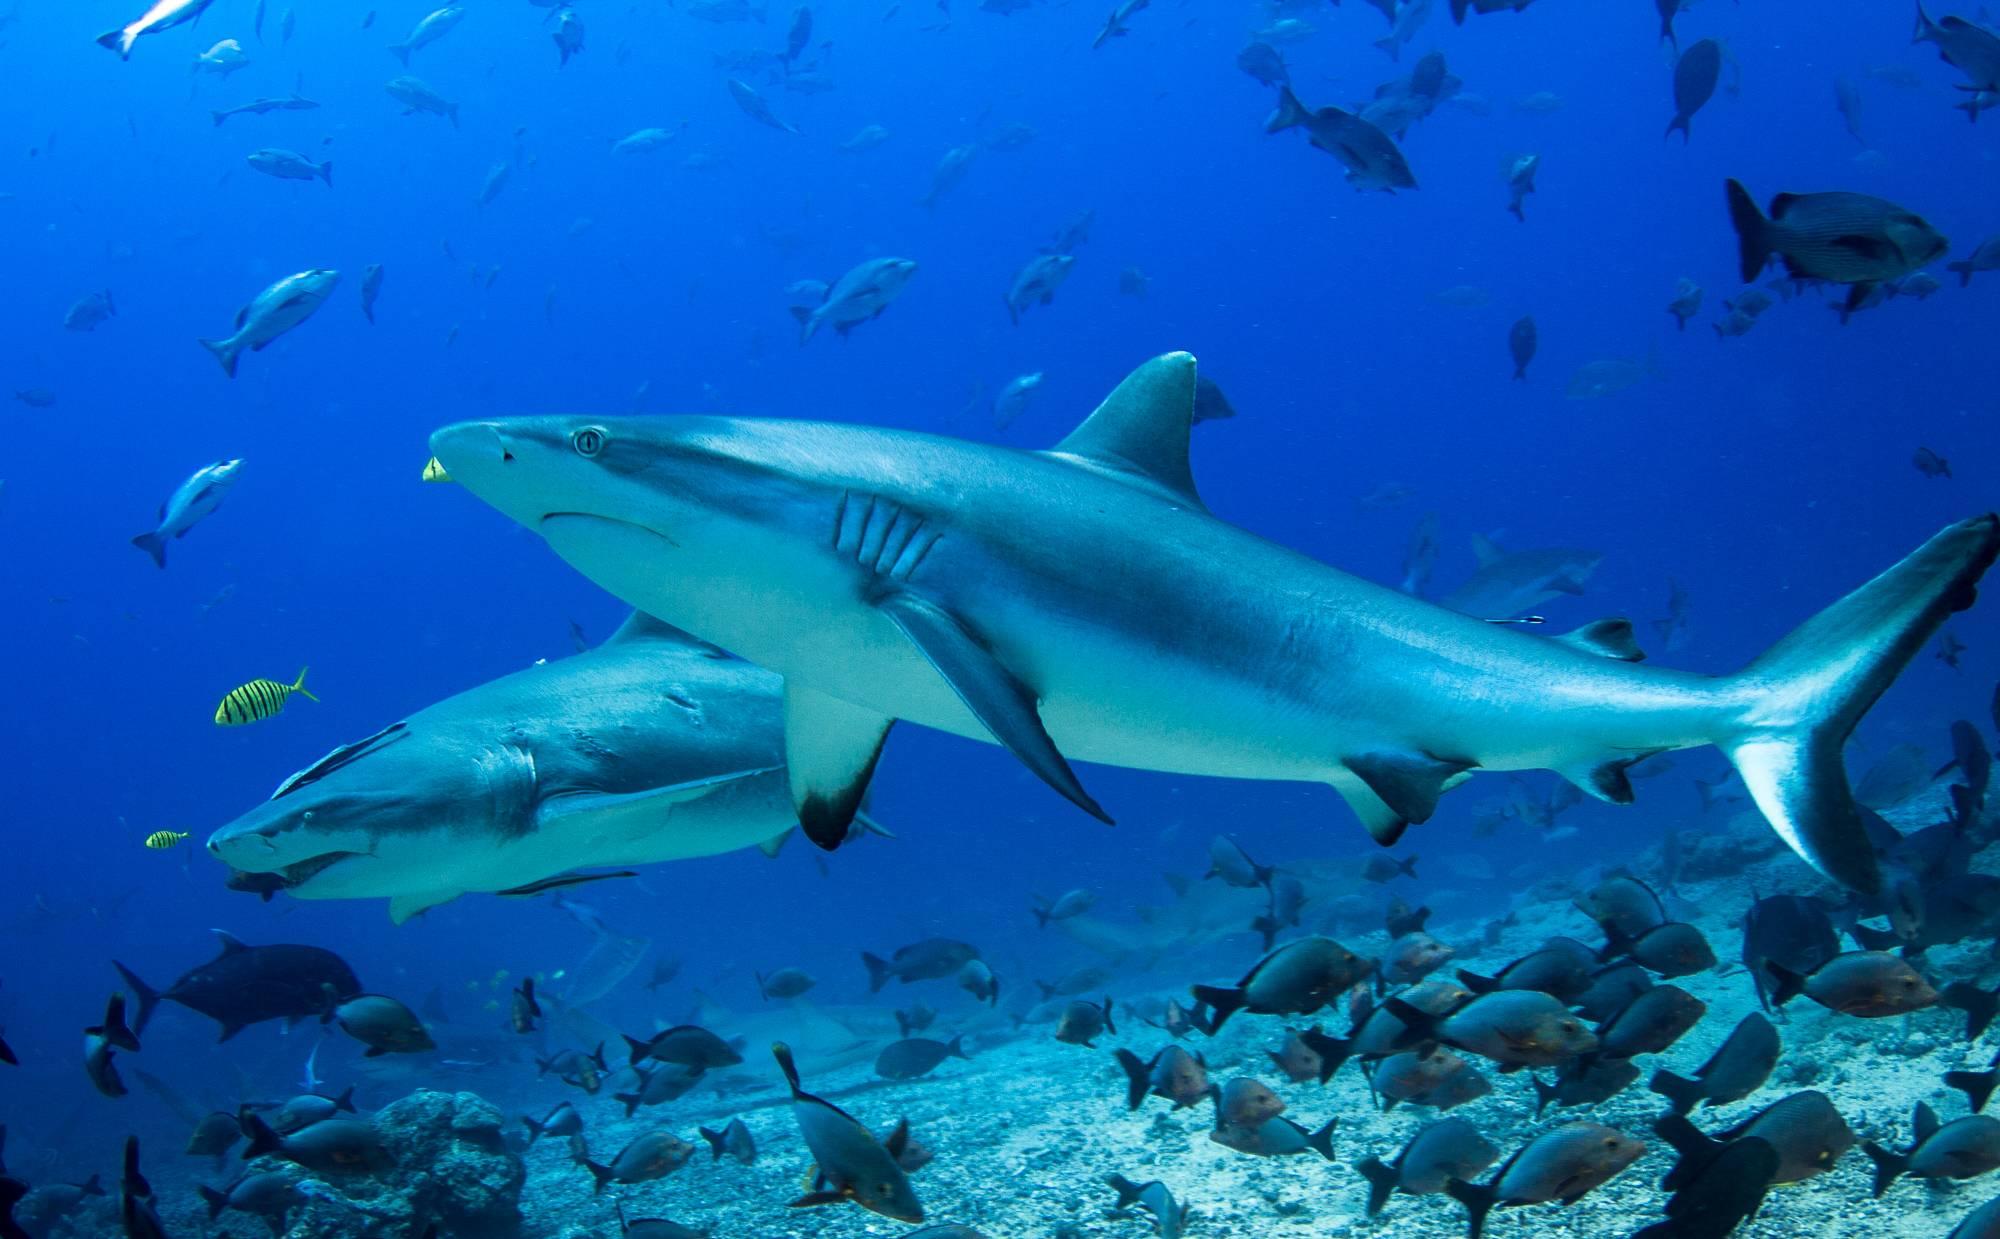 обои море, морское дно, рыбы, акулы картинки фото